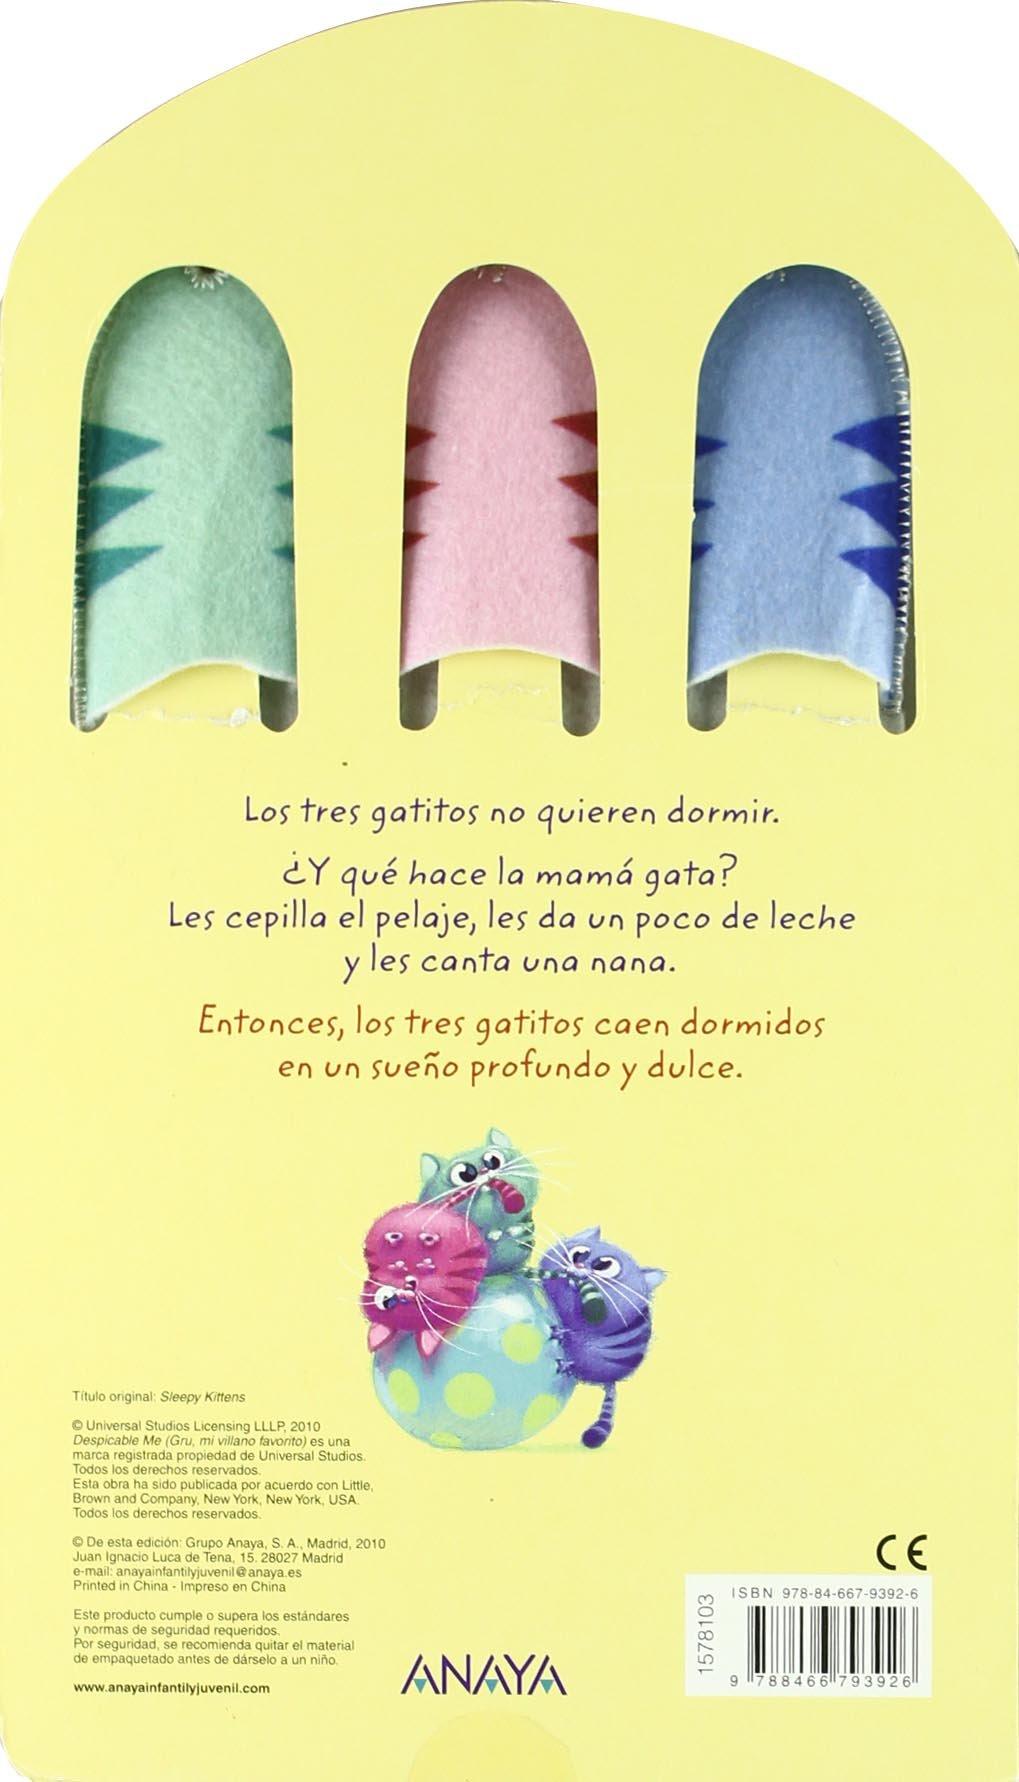 Los gatitos dormilones / Sleepy kittens (Spanish Edition): Cinco Paul, Ken Daurio, Eric Guillon: 9788466793926: Amazon.com: Books